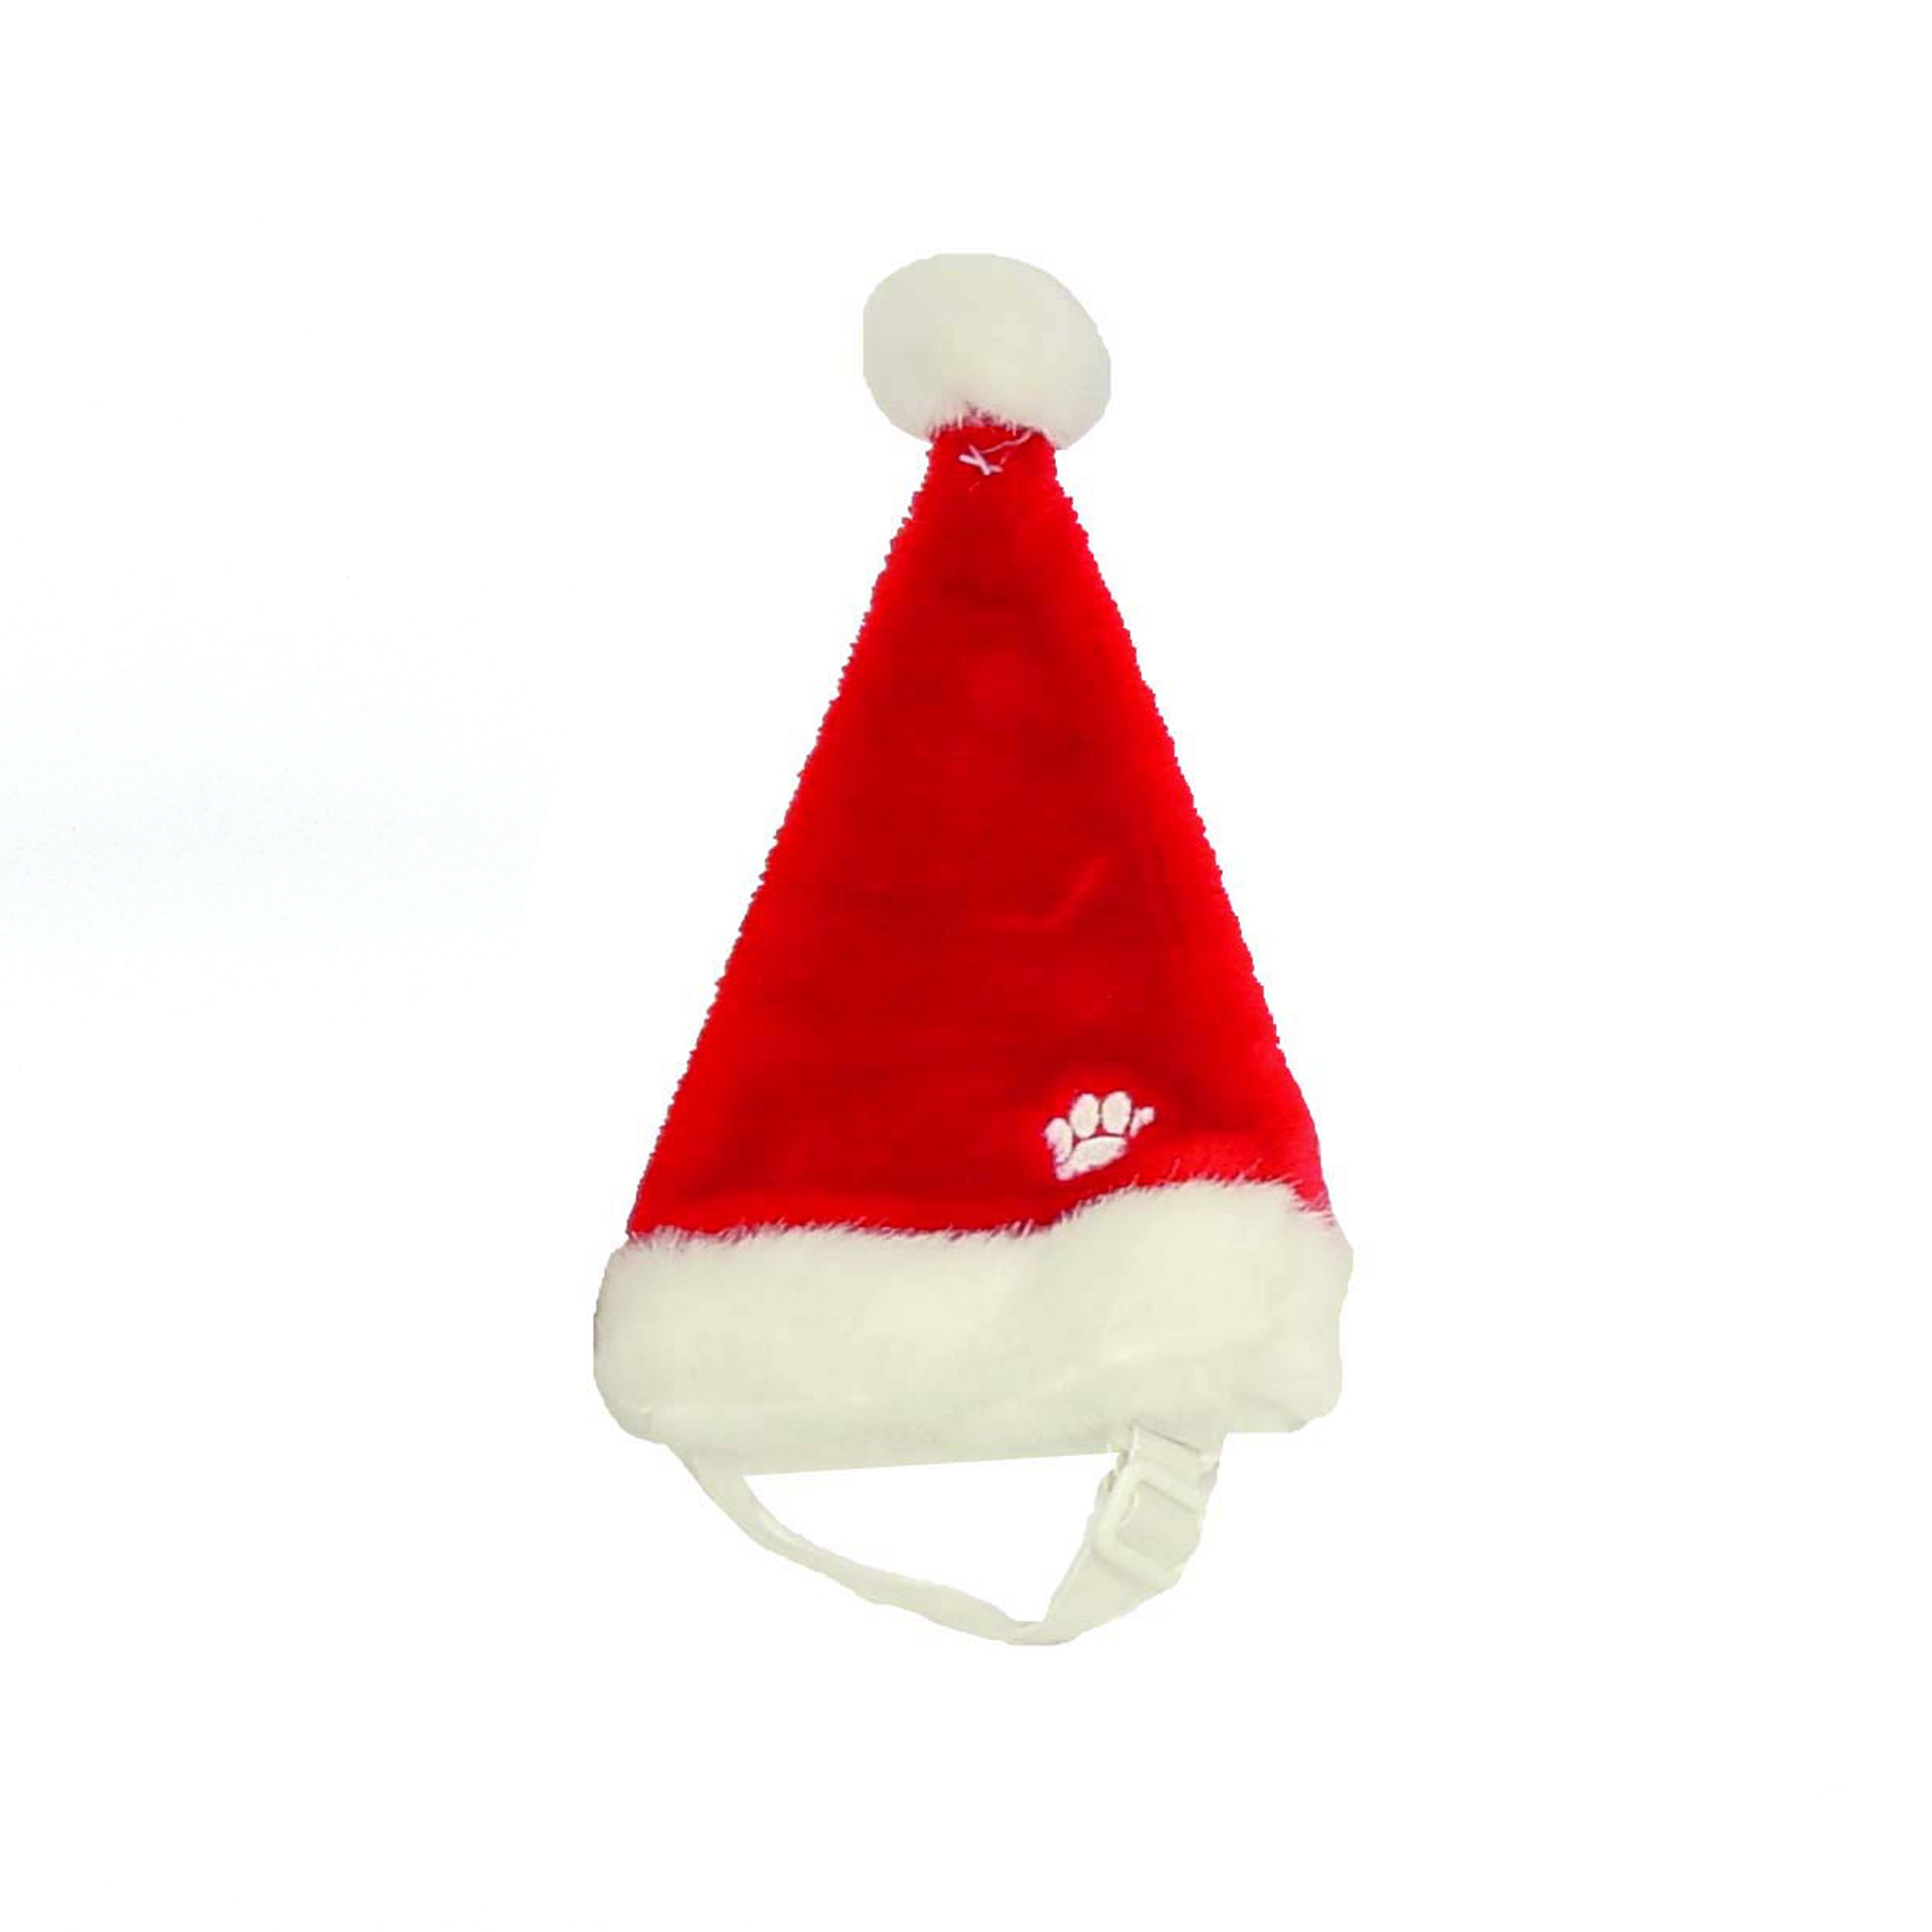 Outward Hound Kyjen  30037 Dog Santa Hat Holiday and Christmas Pet Accessory, Medium, Red